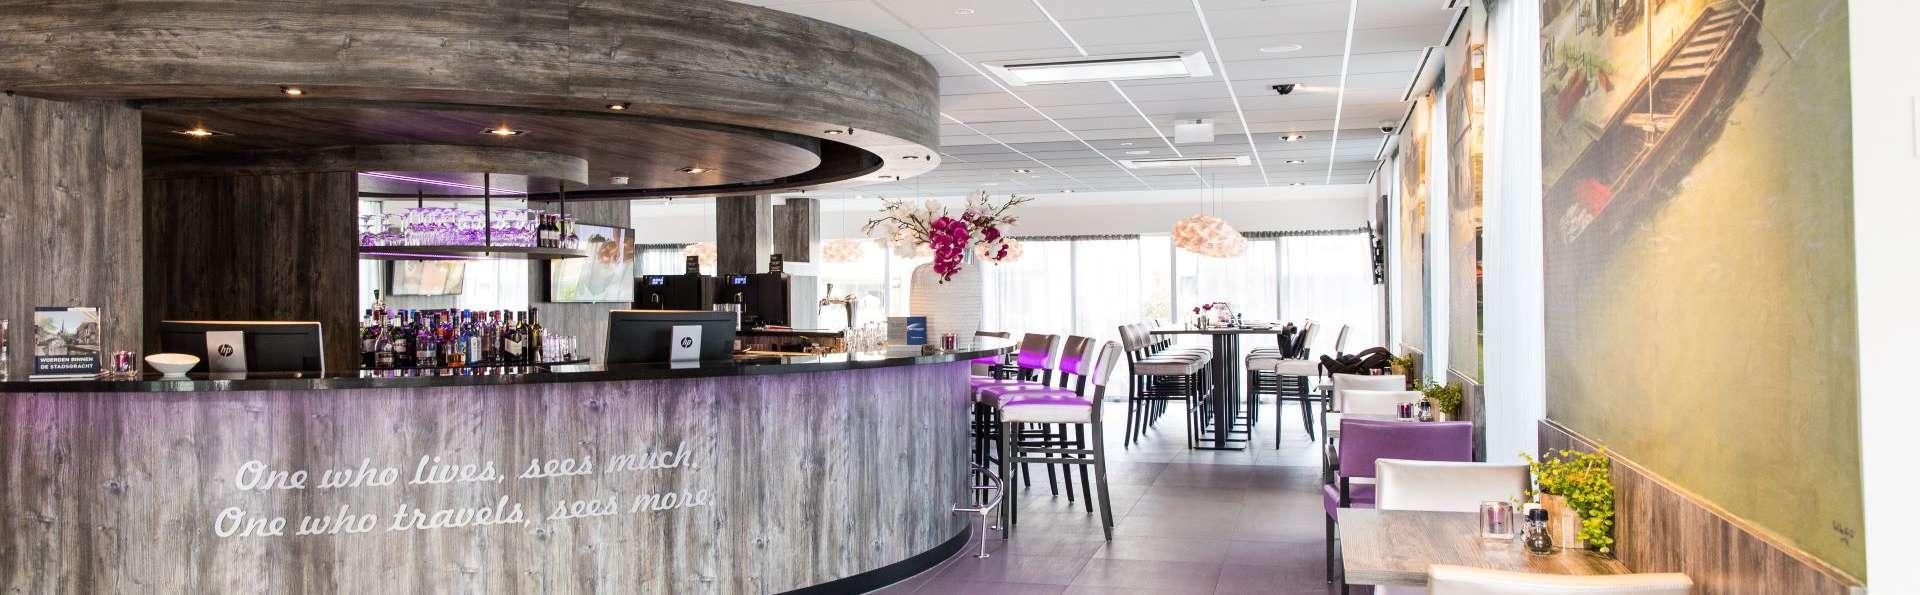 Best Western City Hotel Woerden - receptie_voorkant_EDIT.jpg